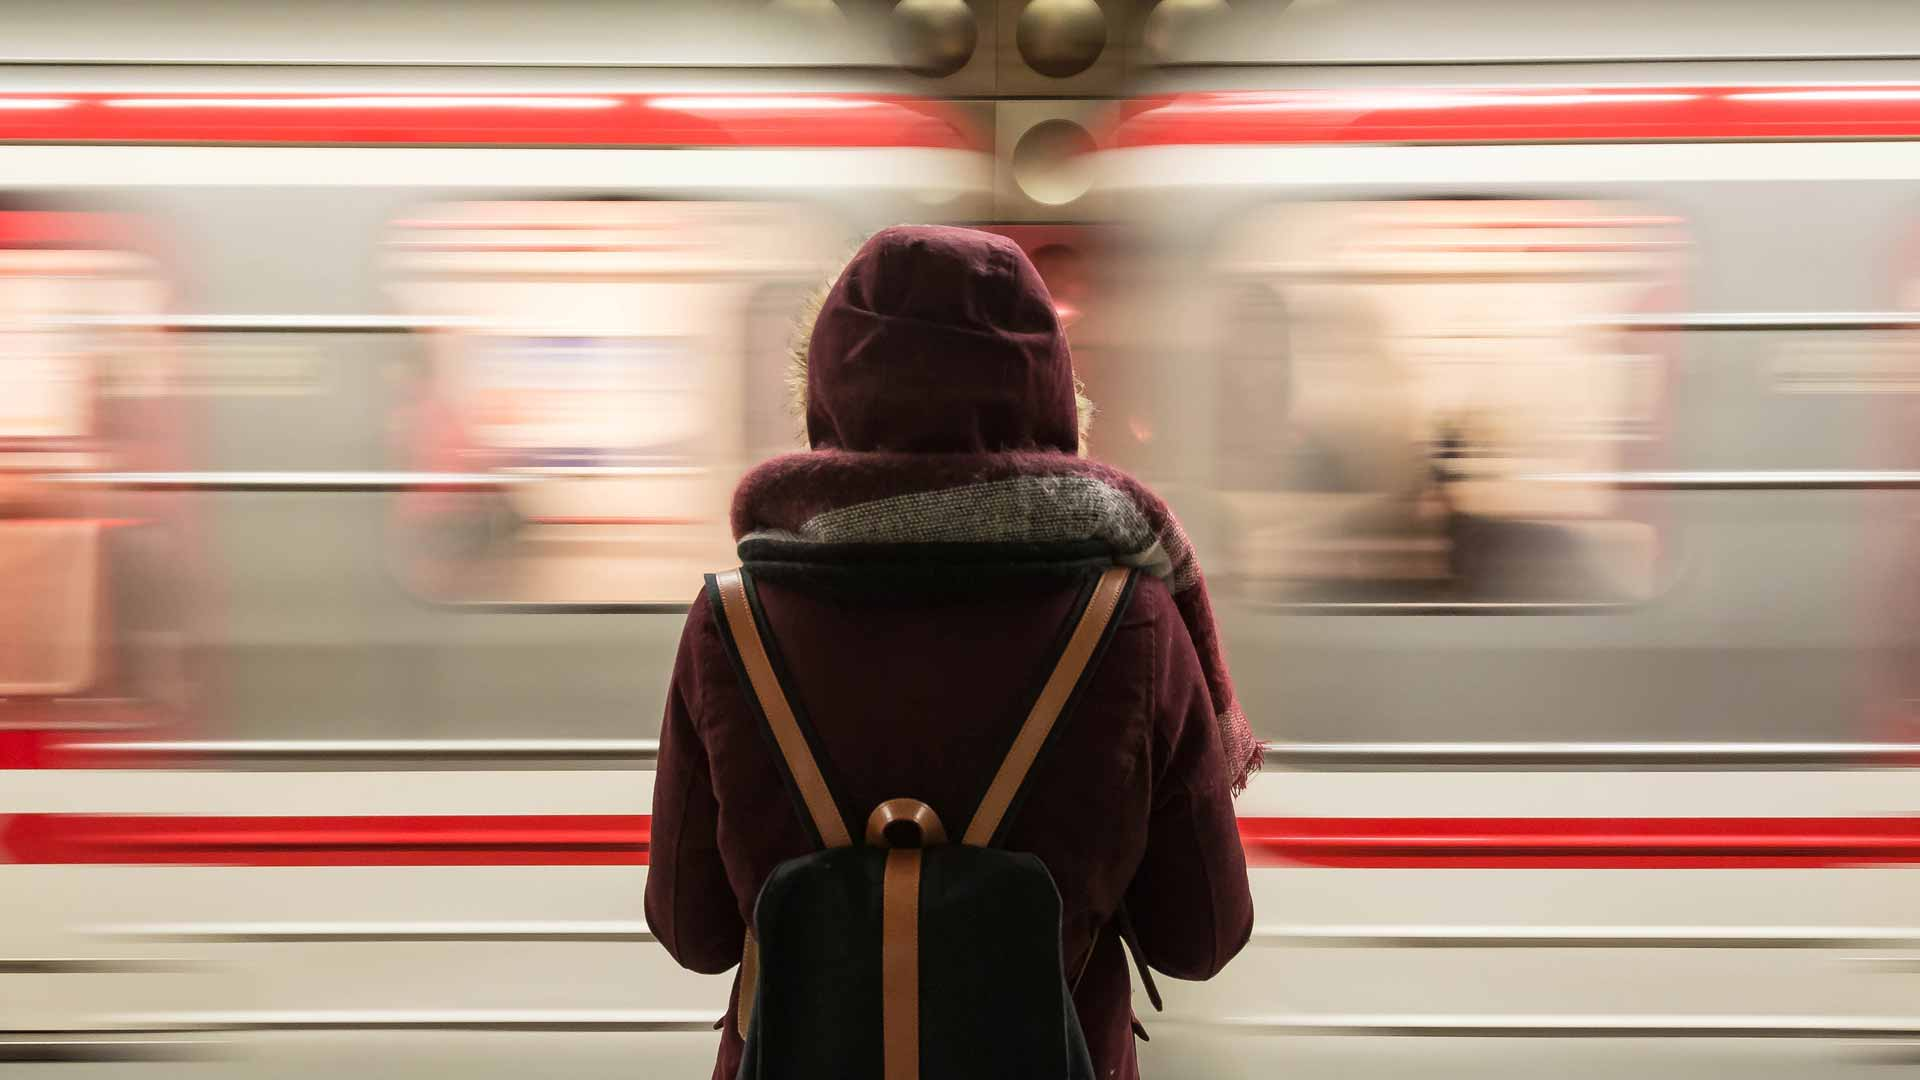 menina a espera do trem